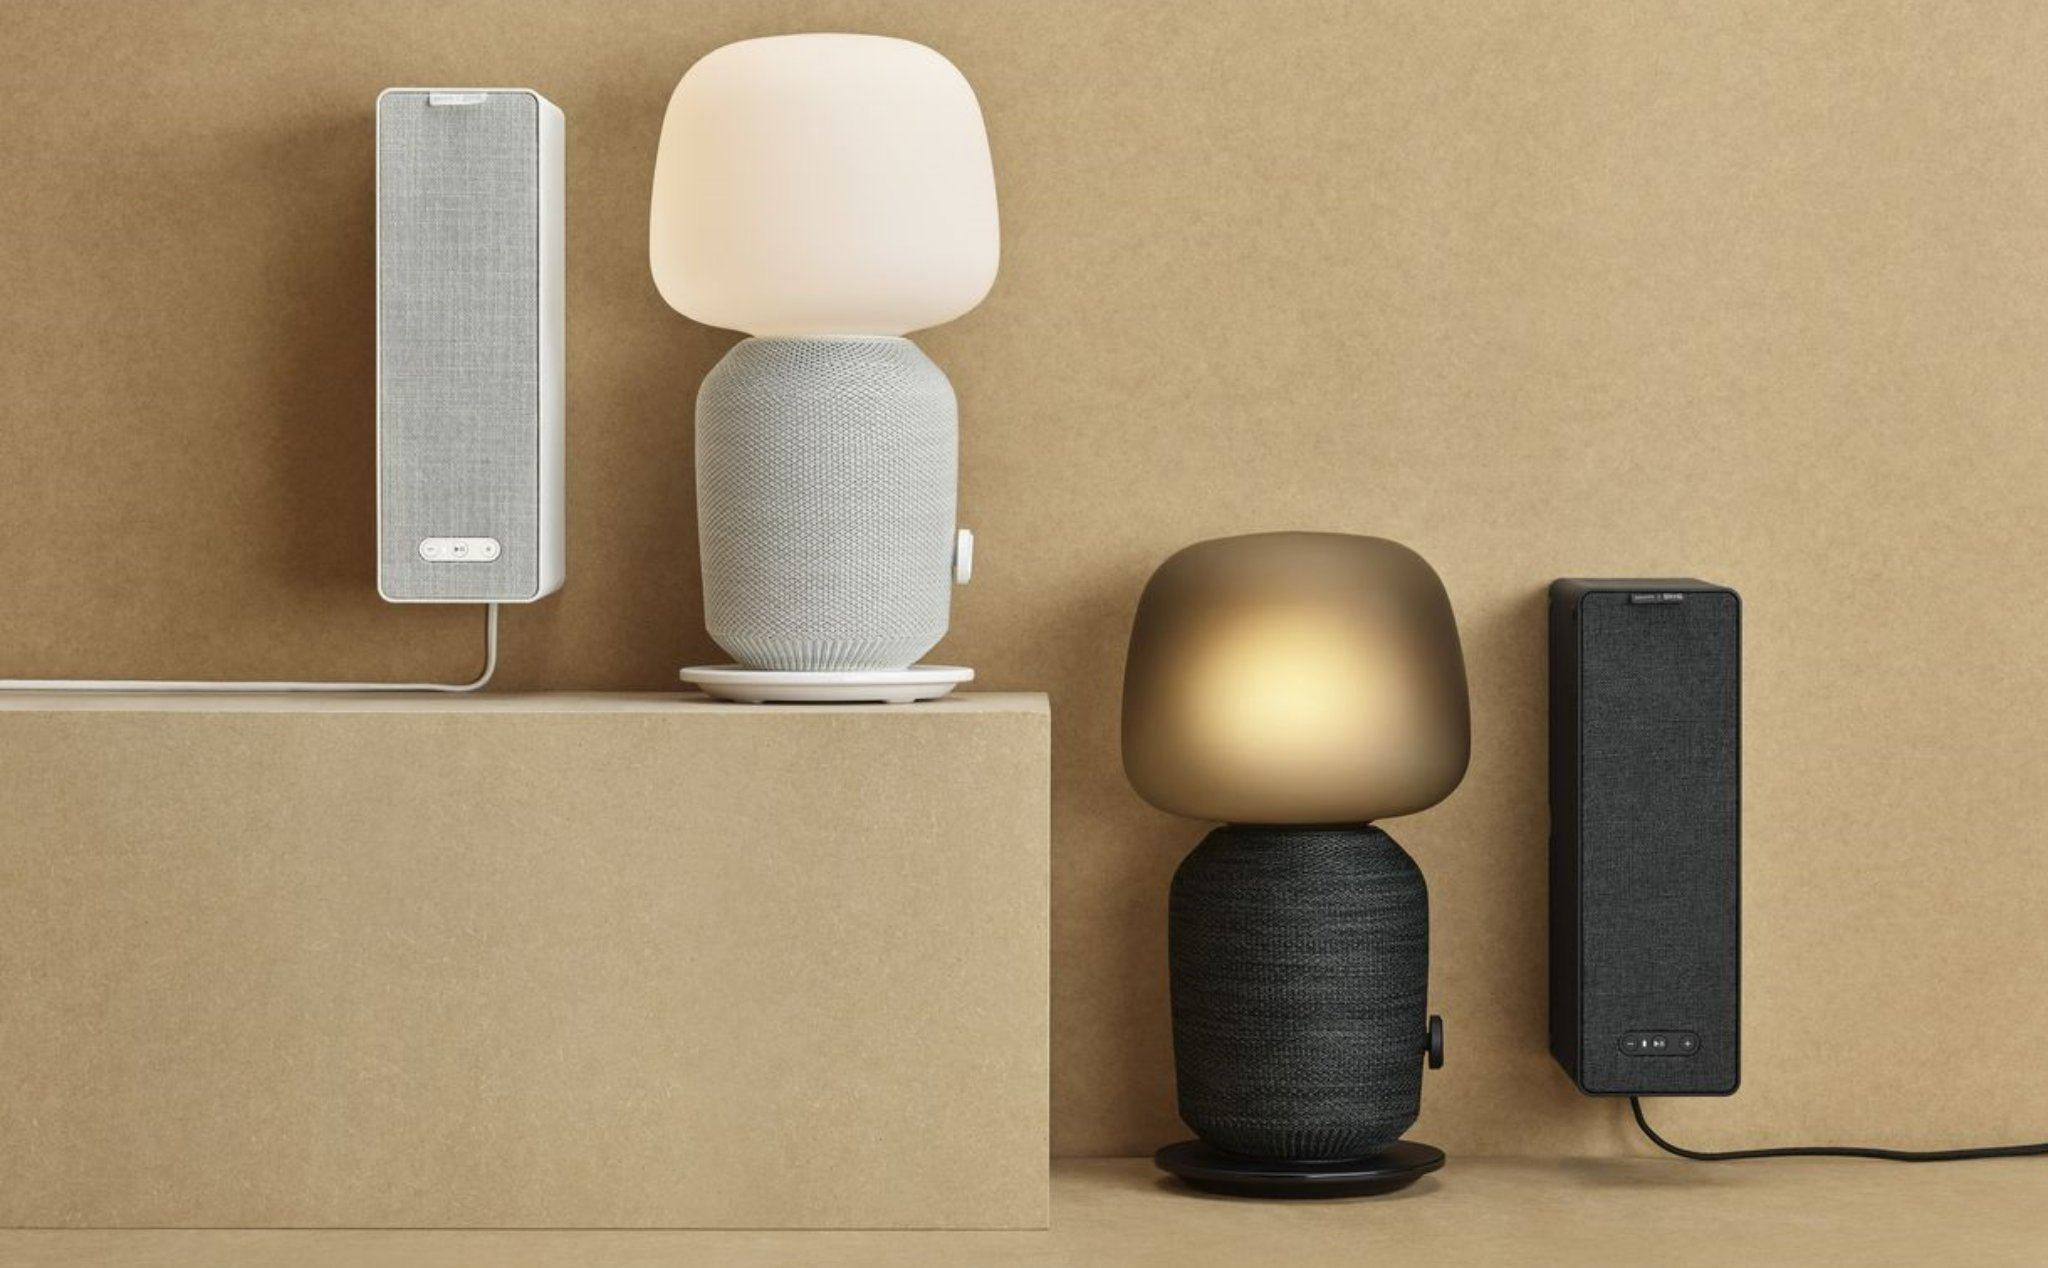 Kết quả hình ảnh cho Loa Bookshelf WiFi của Ikea Sonos Symfonisk